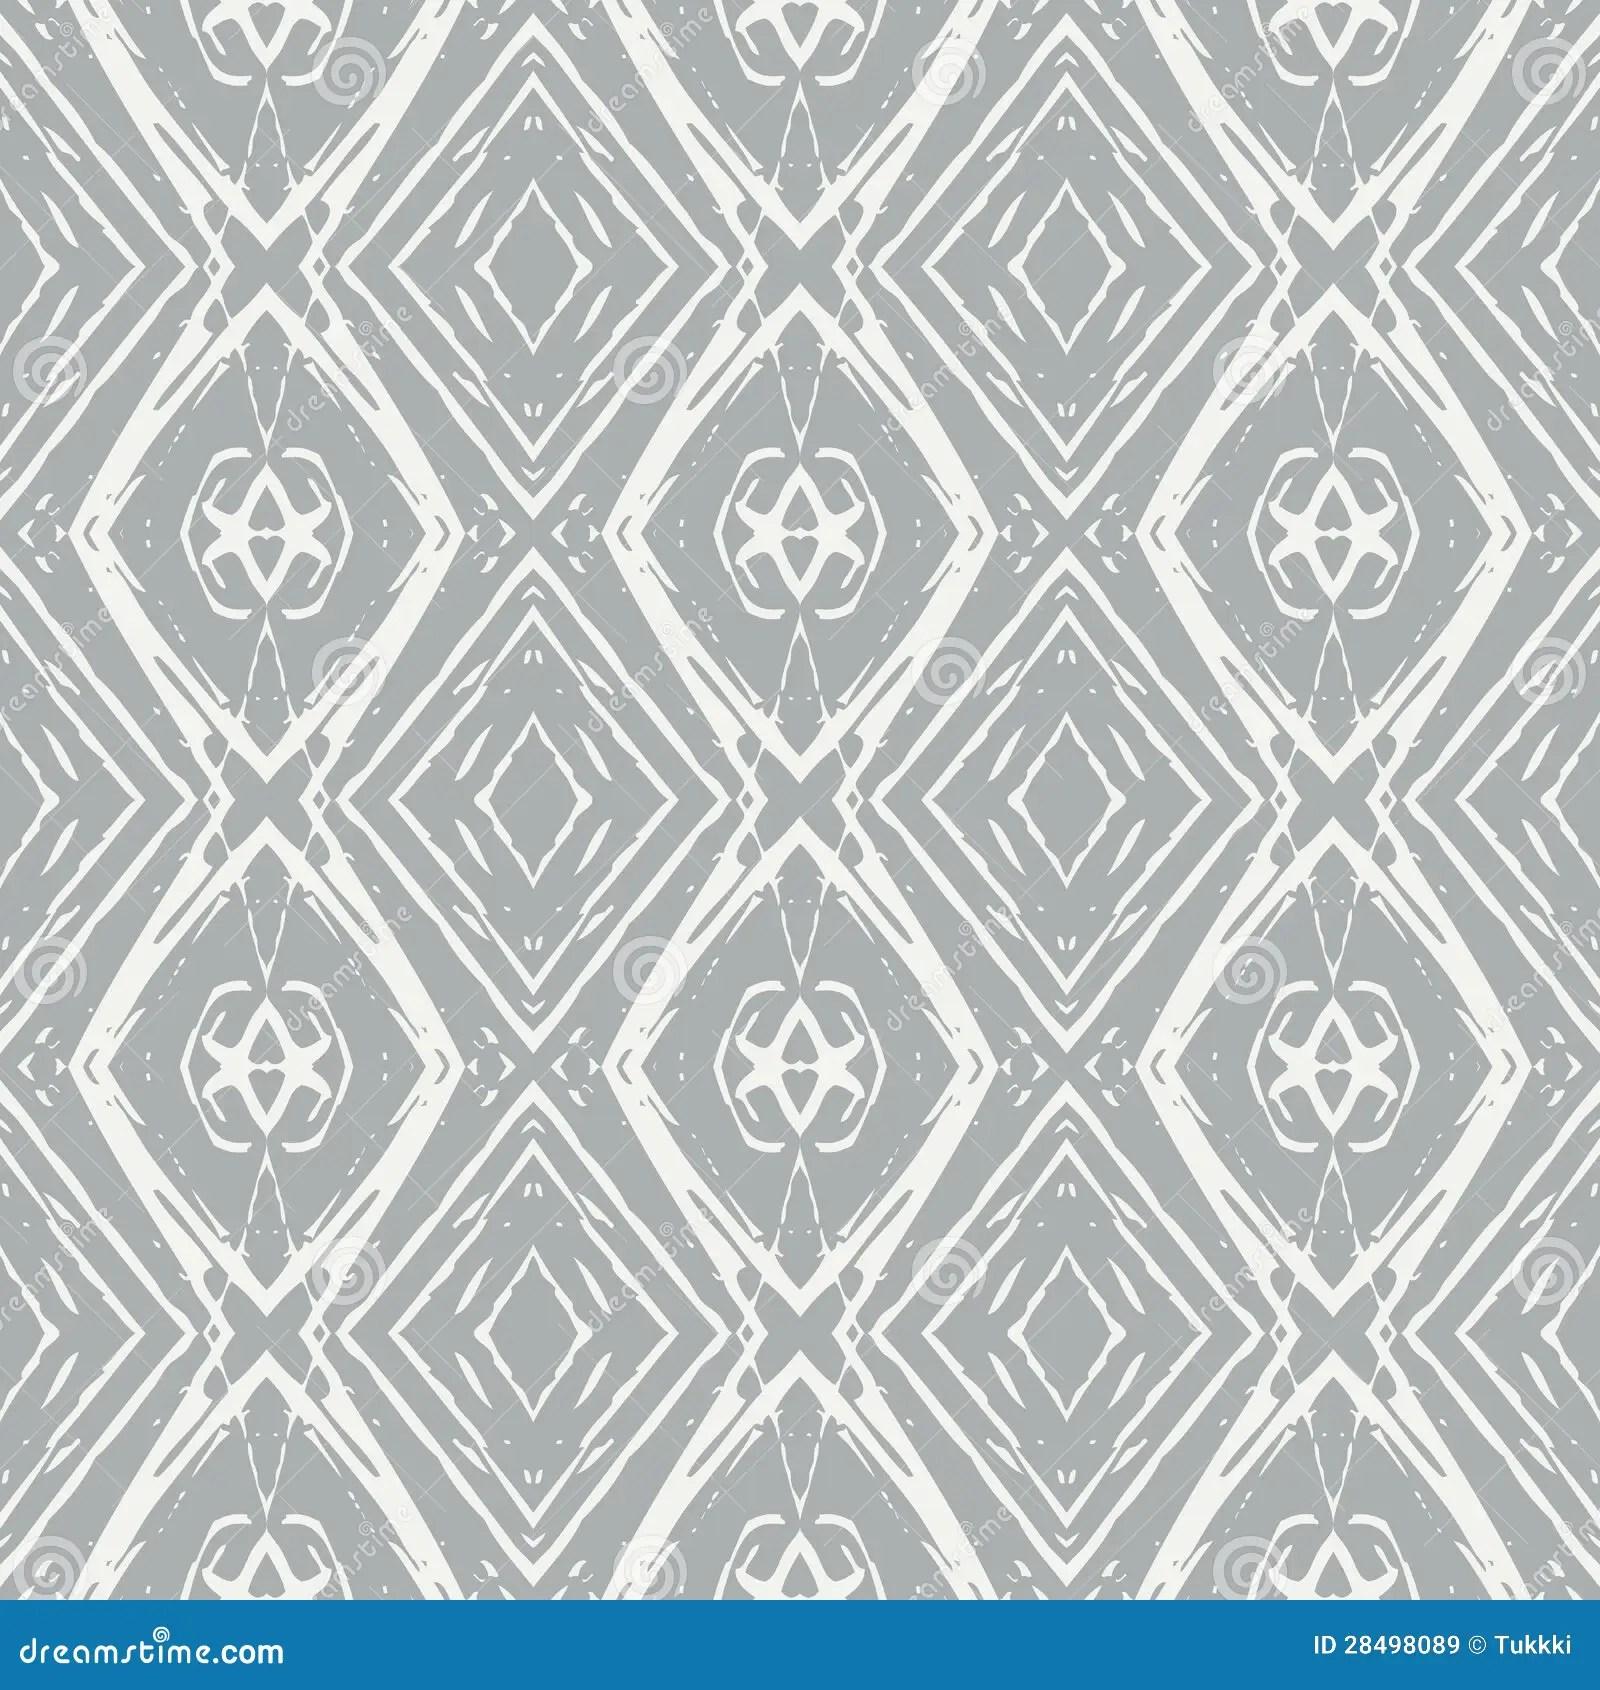 simple designs patterns scandinavian design simple